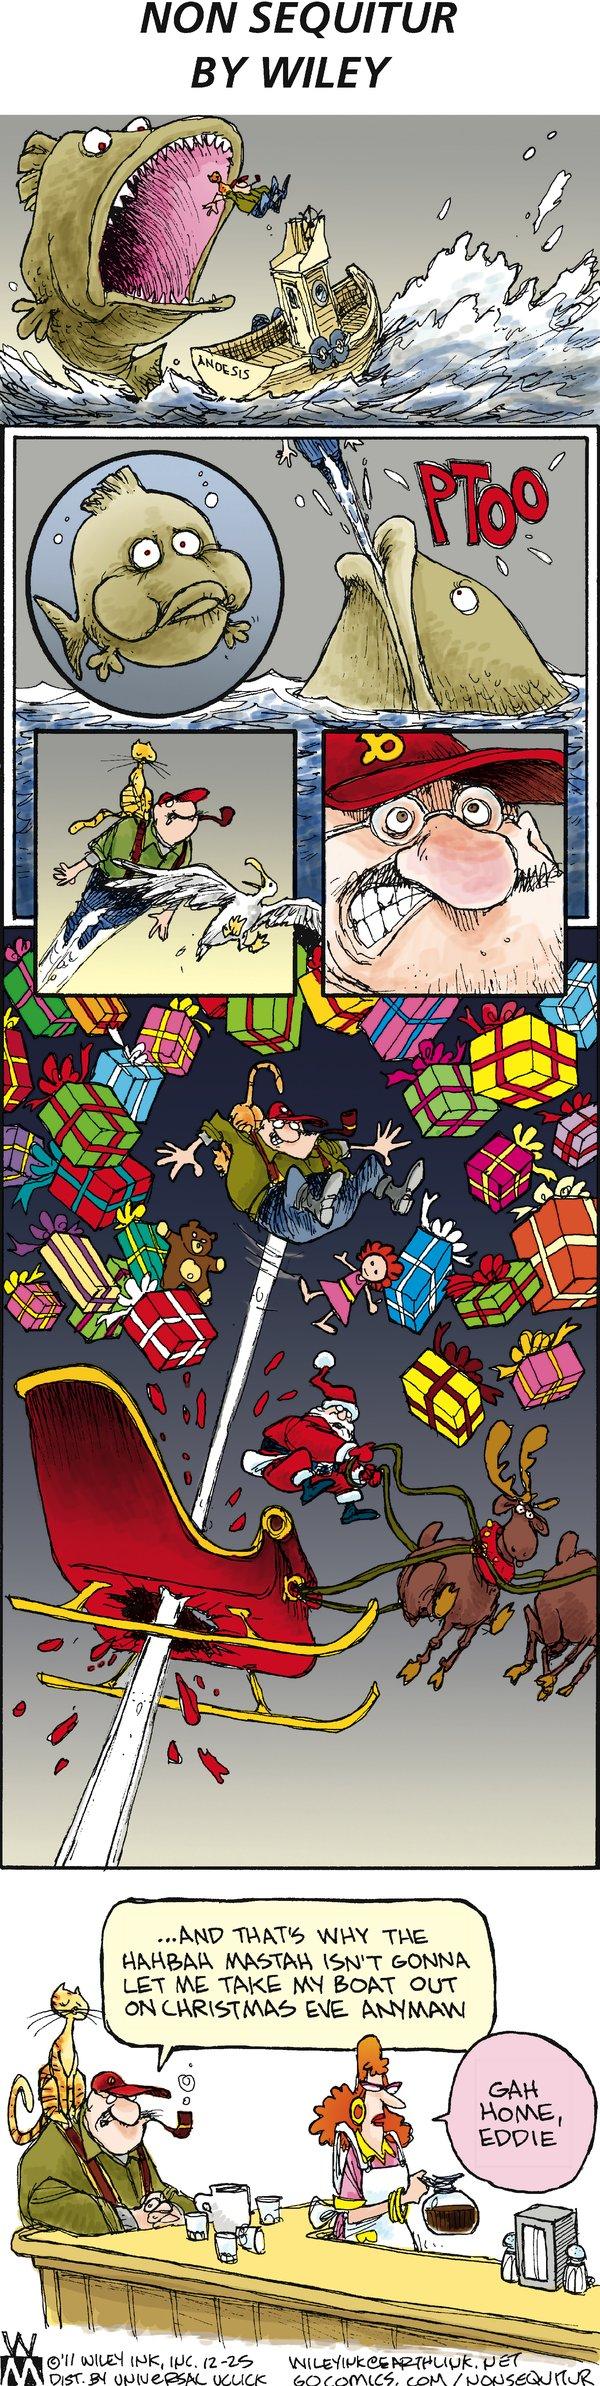 Non Sequitur Comic Strip for December 25, 2011